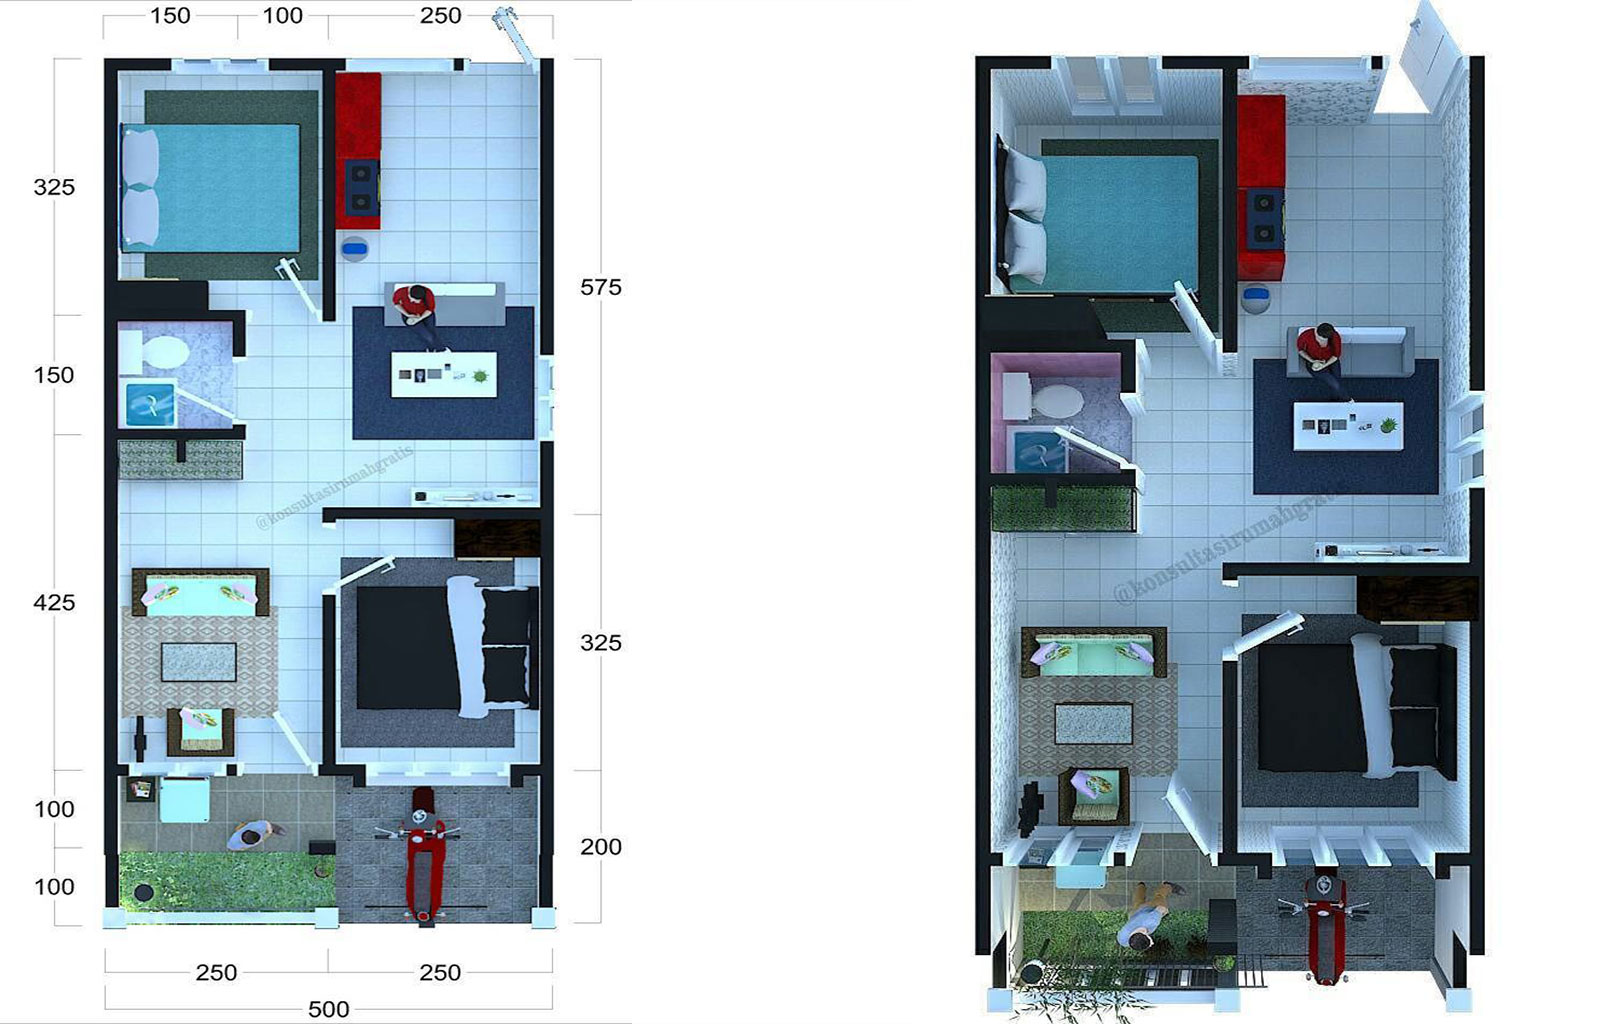 Denah Rumah 6x10 M Atau Denah Rumah Minimalis